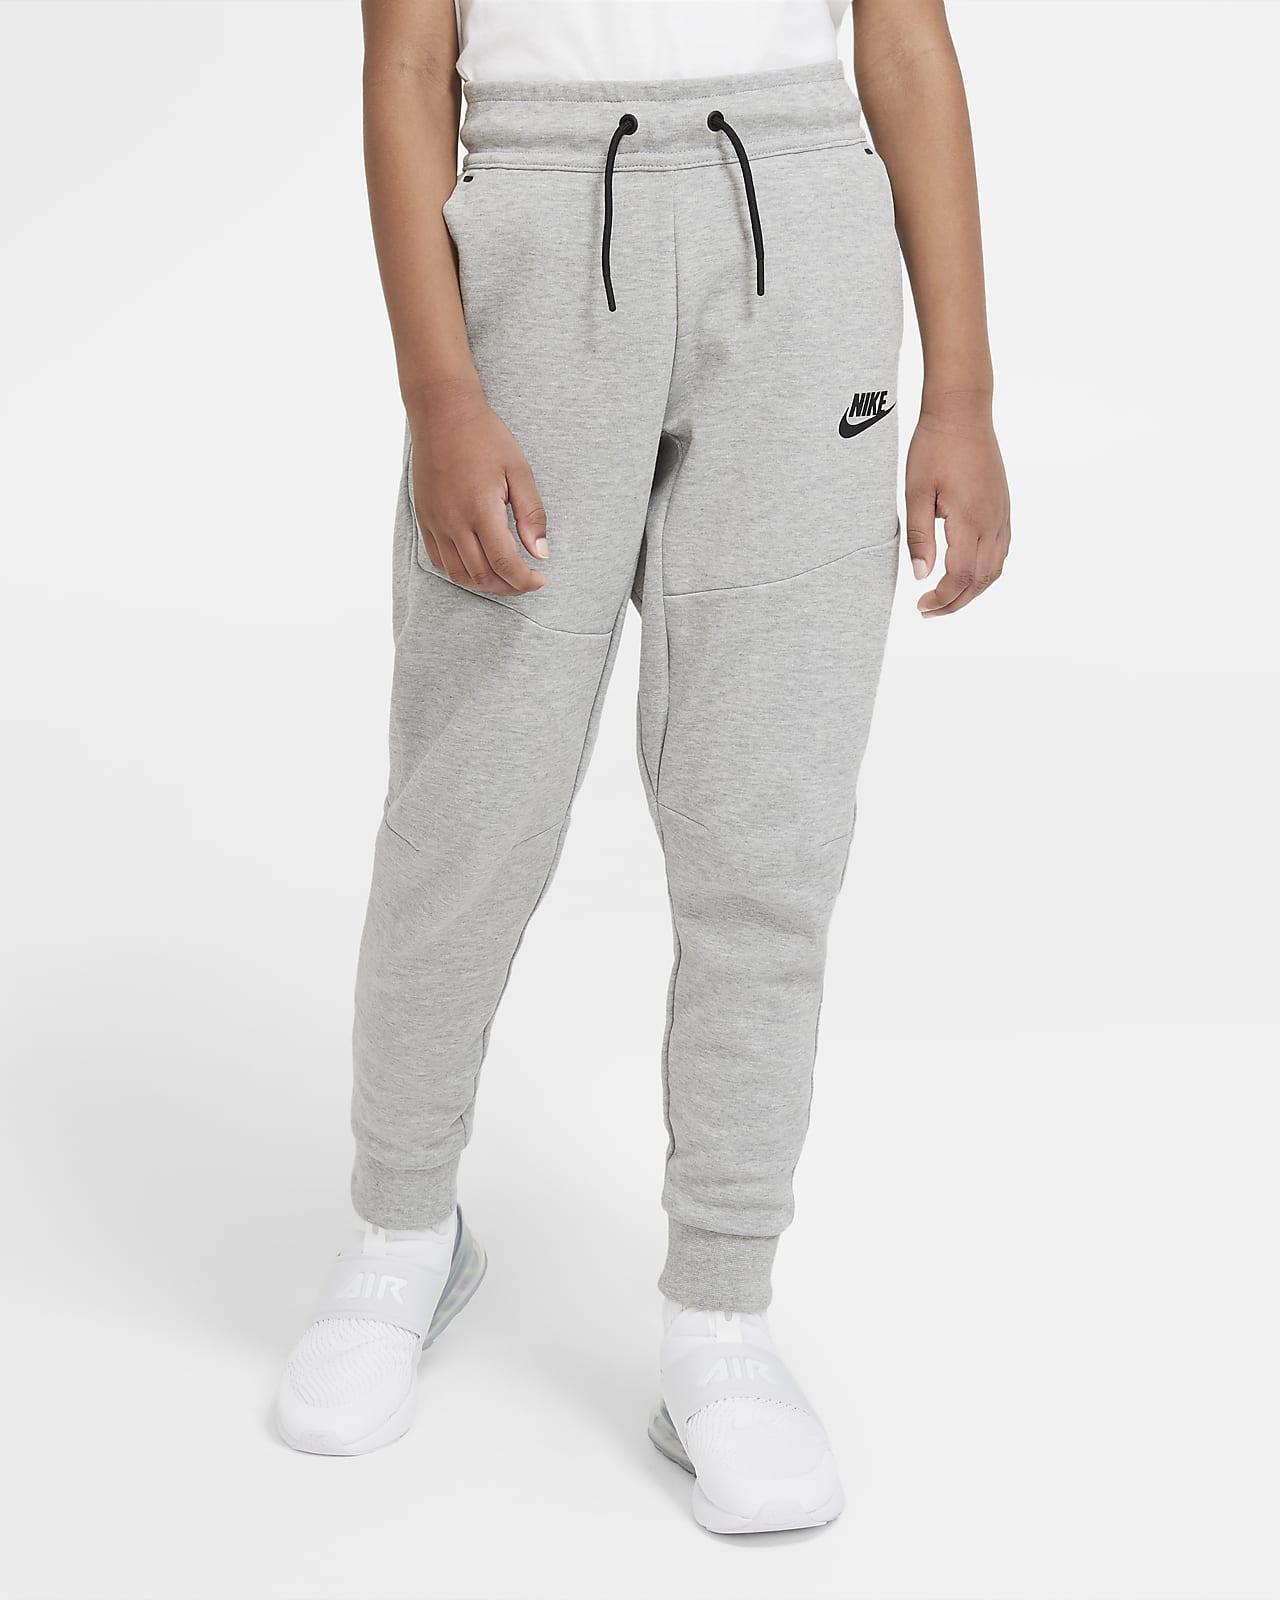 Брюки для мальчиков школьного возраста Nike Sportswear Tech Fleece